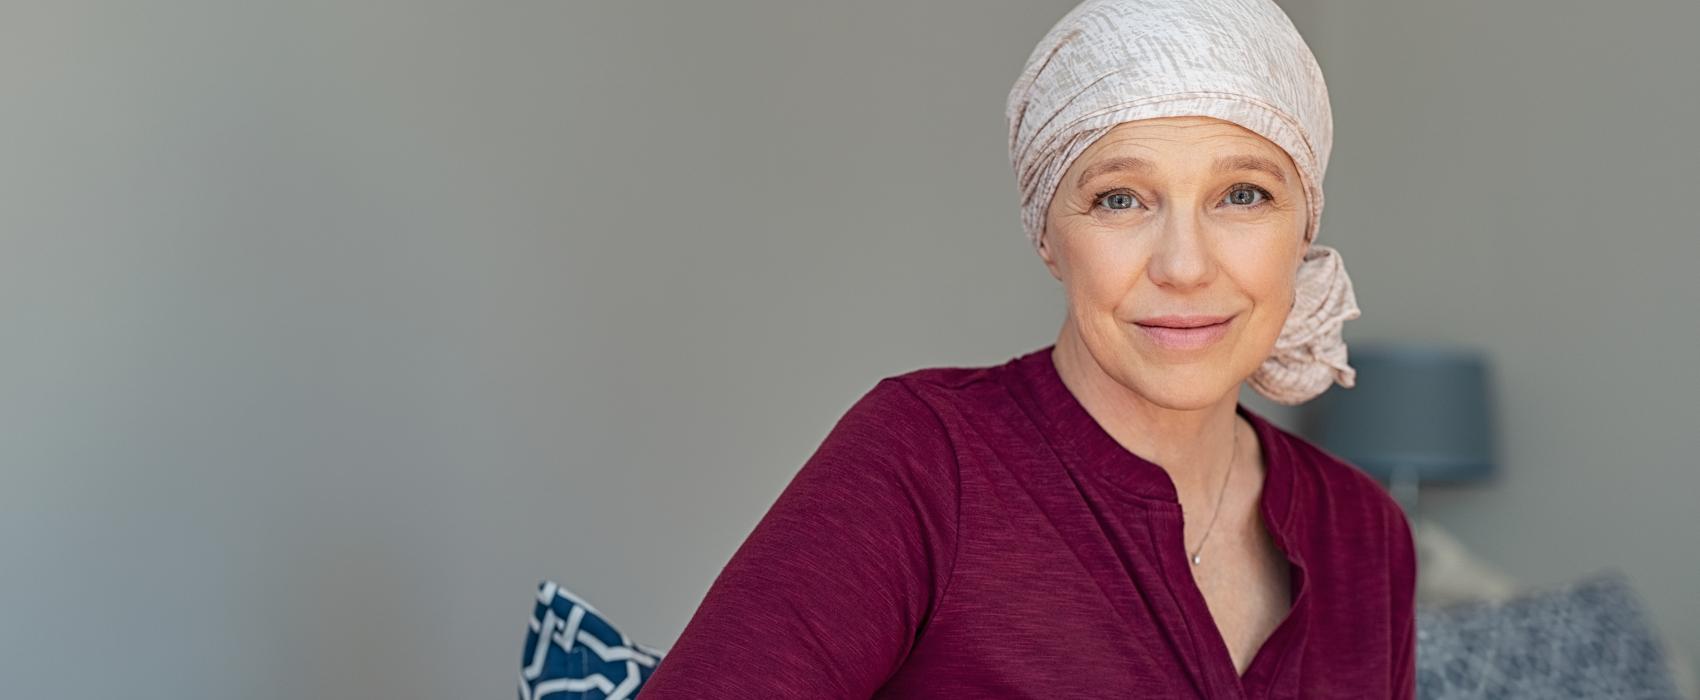 LP_Hero-1700x700-Woman-Cancer